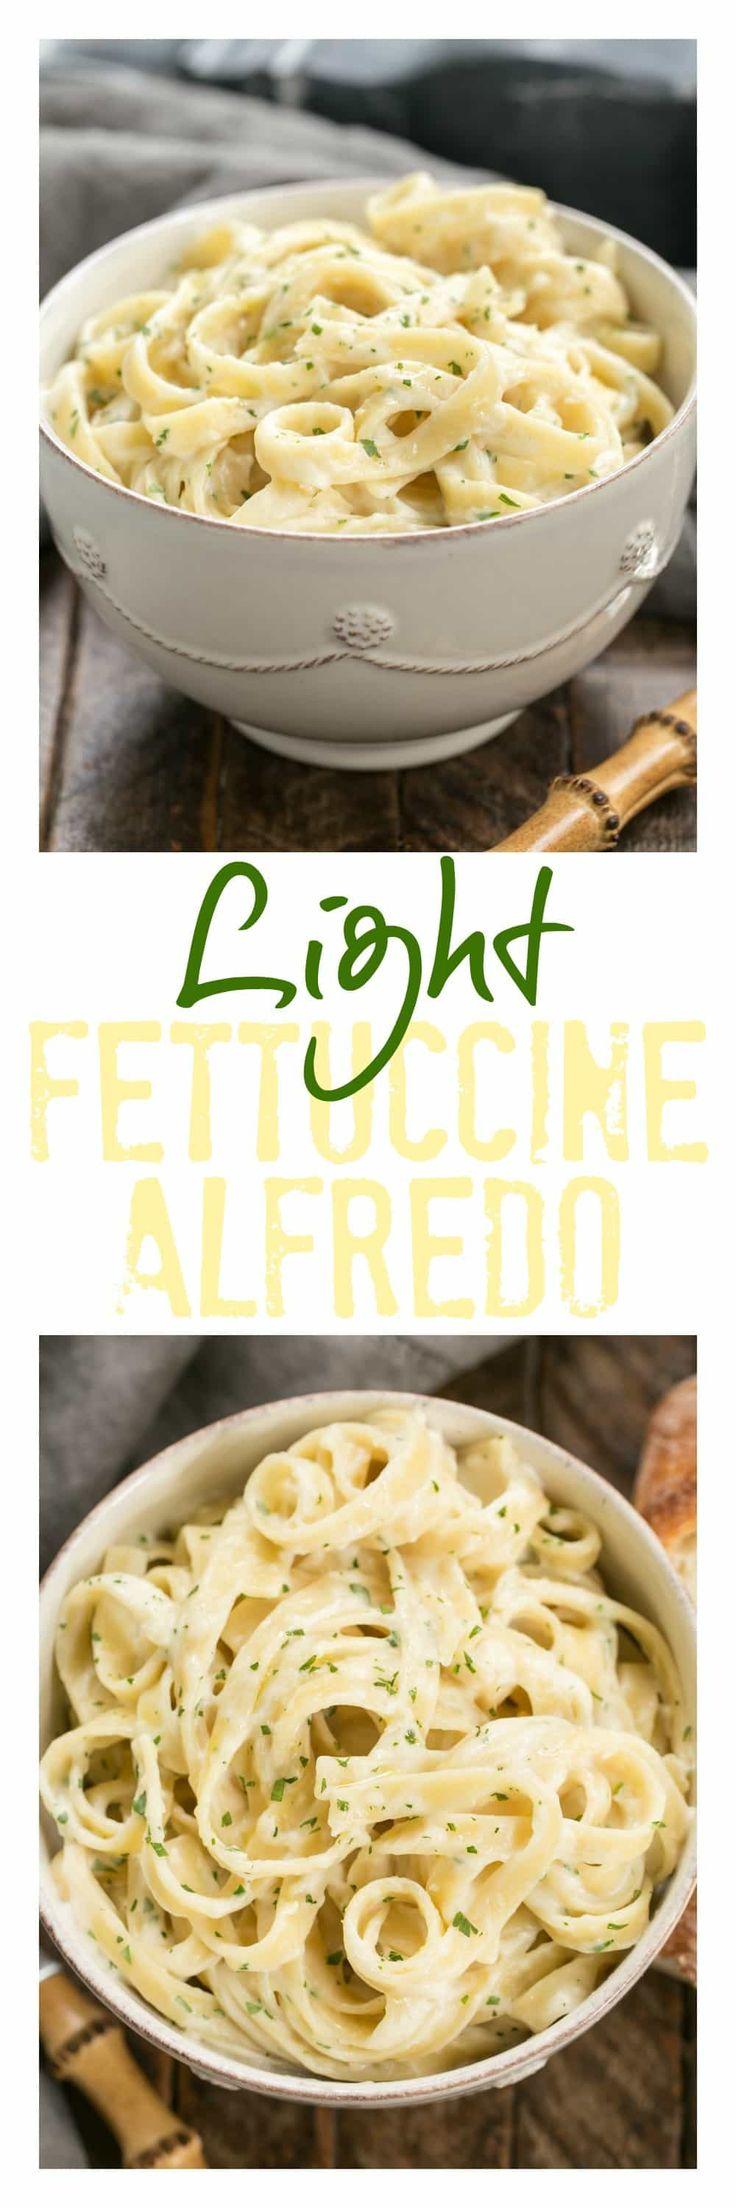 Light Fettuccine Alfredo   A creamy flavorful, lightened up Fettuccine Alfredo that tastes amazing!